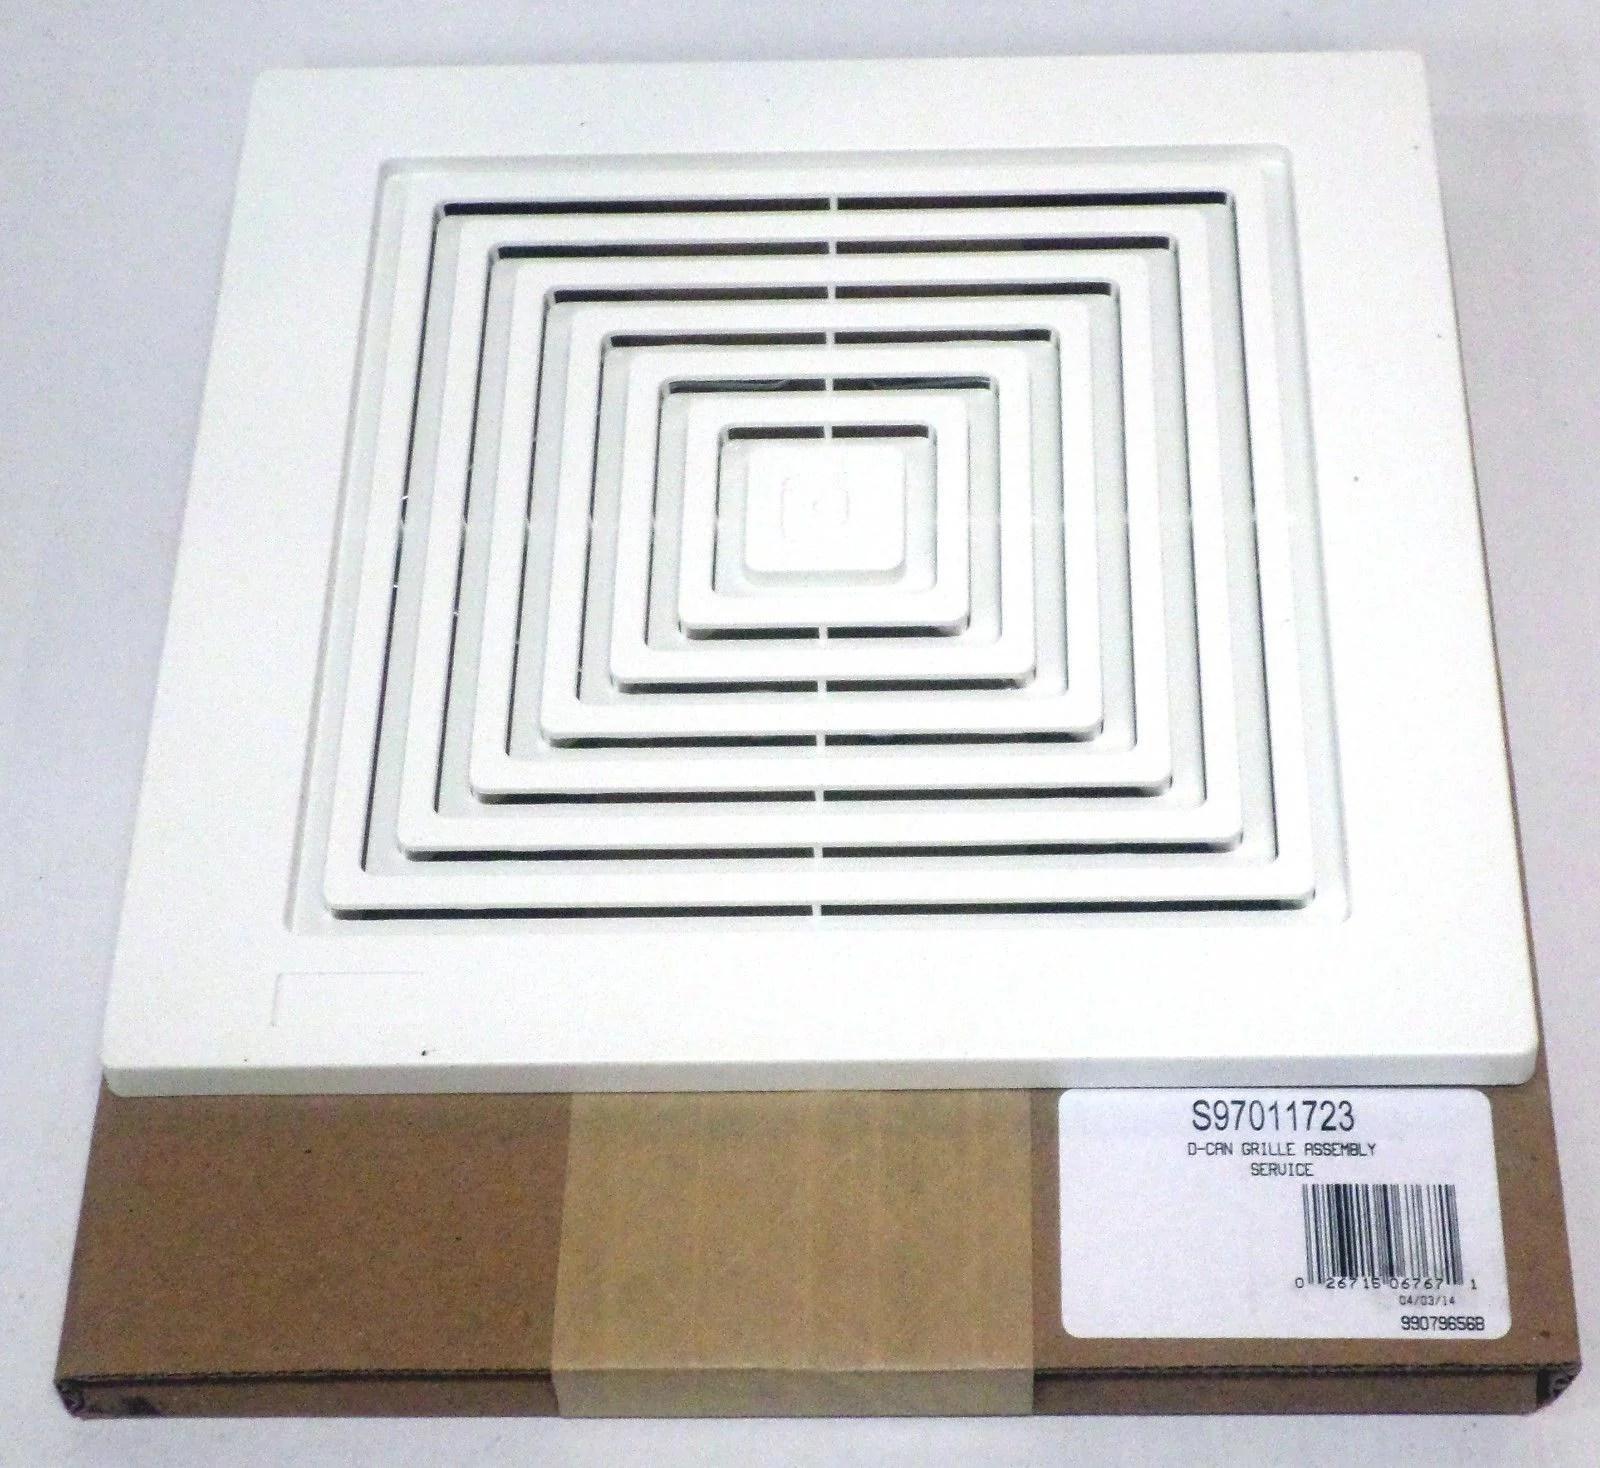 broan nutone 97011723 bath bathroom ceiling fan grille grill cover plastic white walmart com